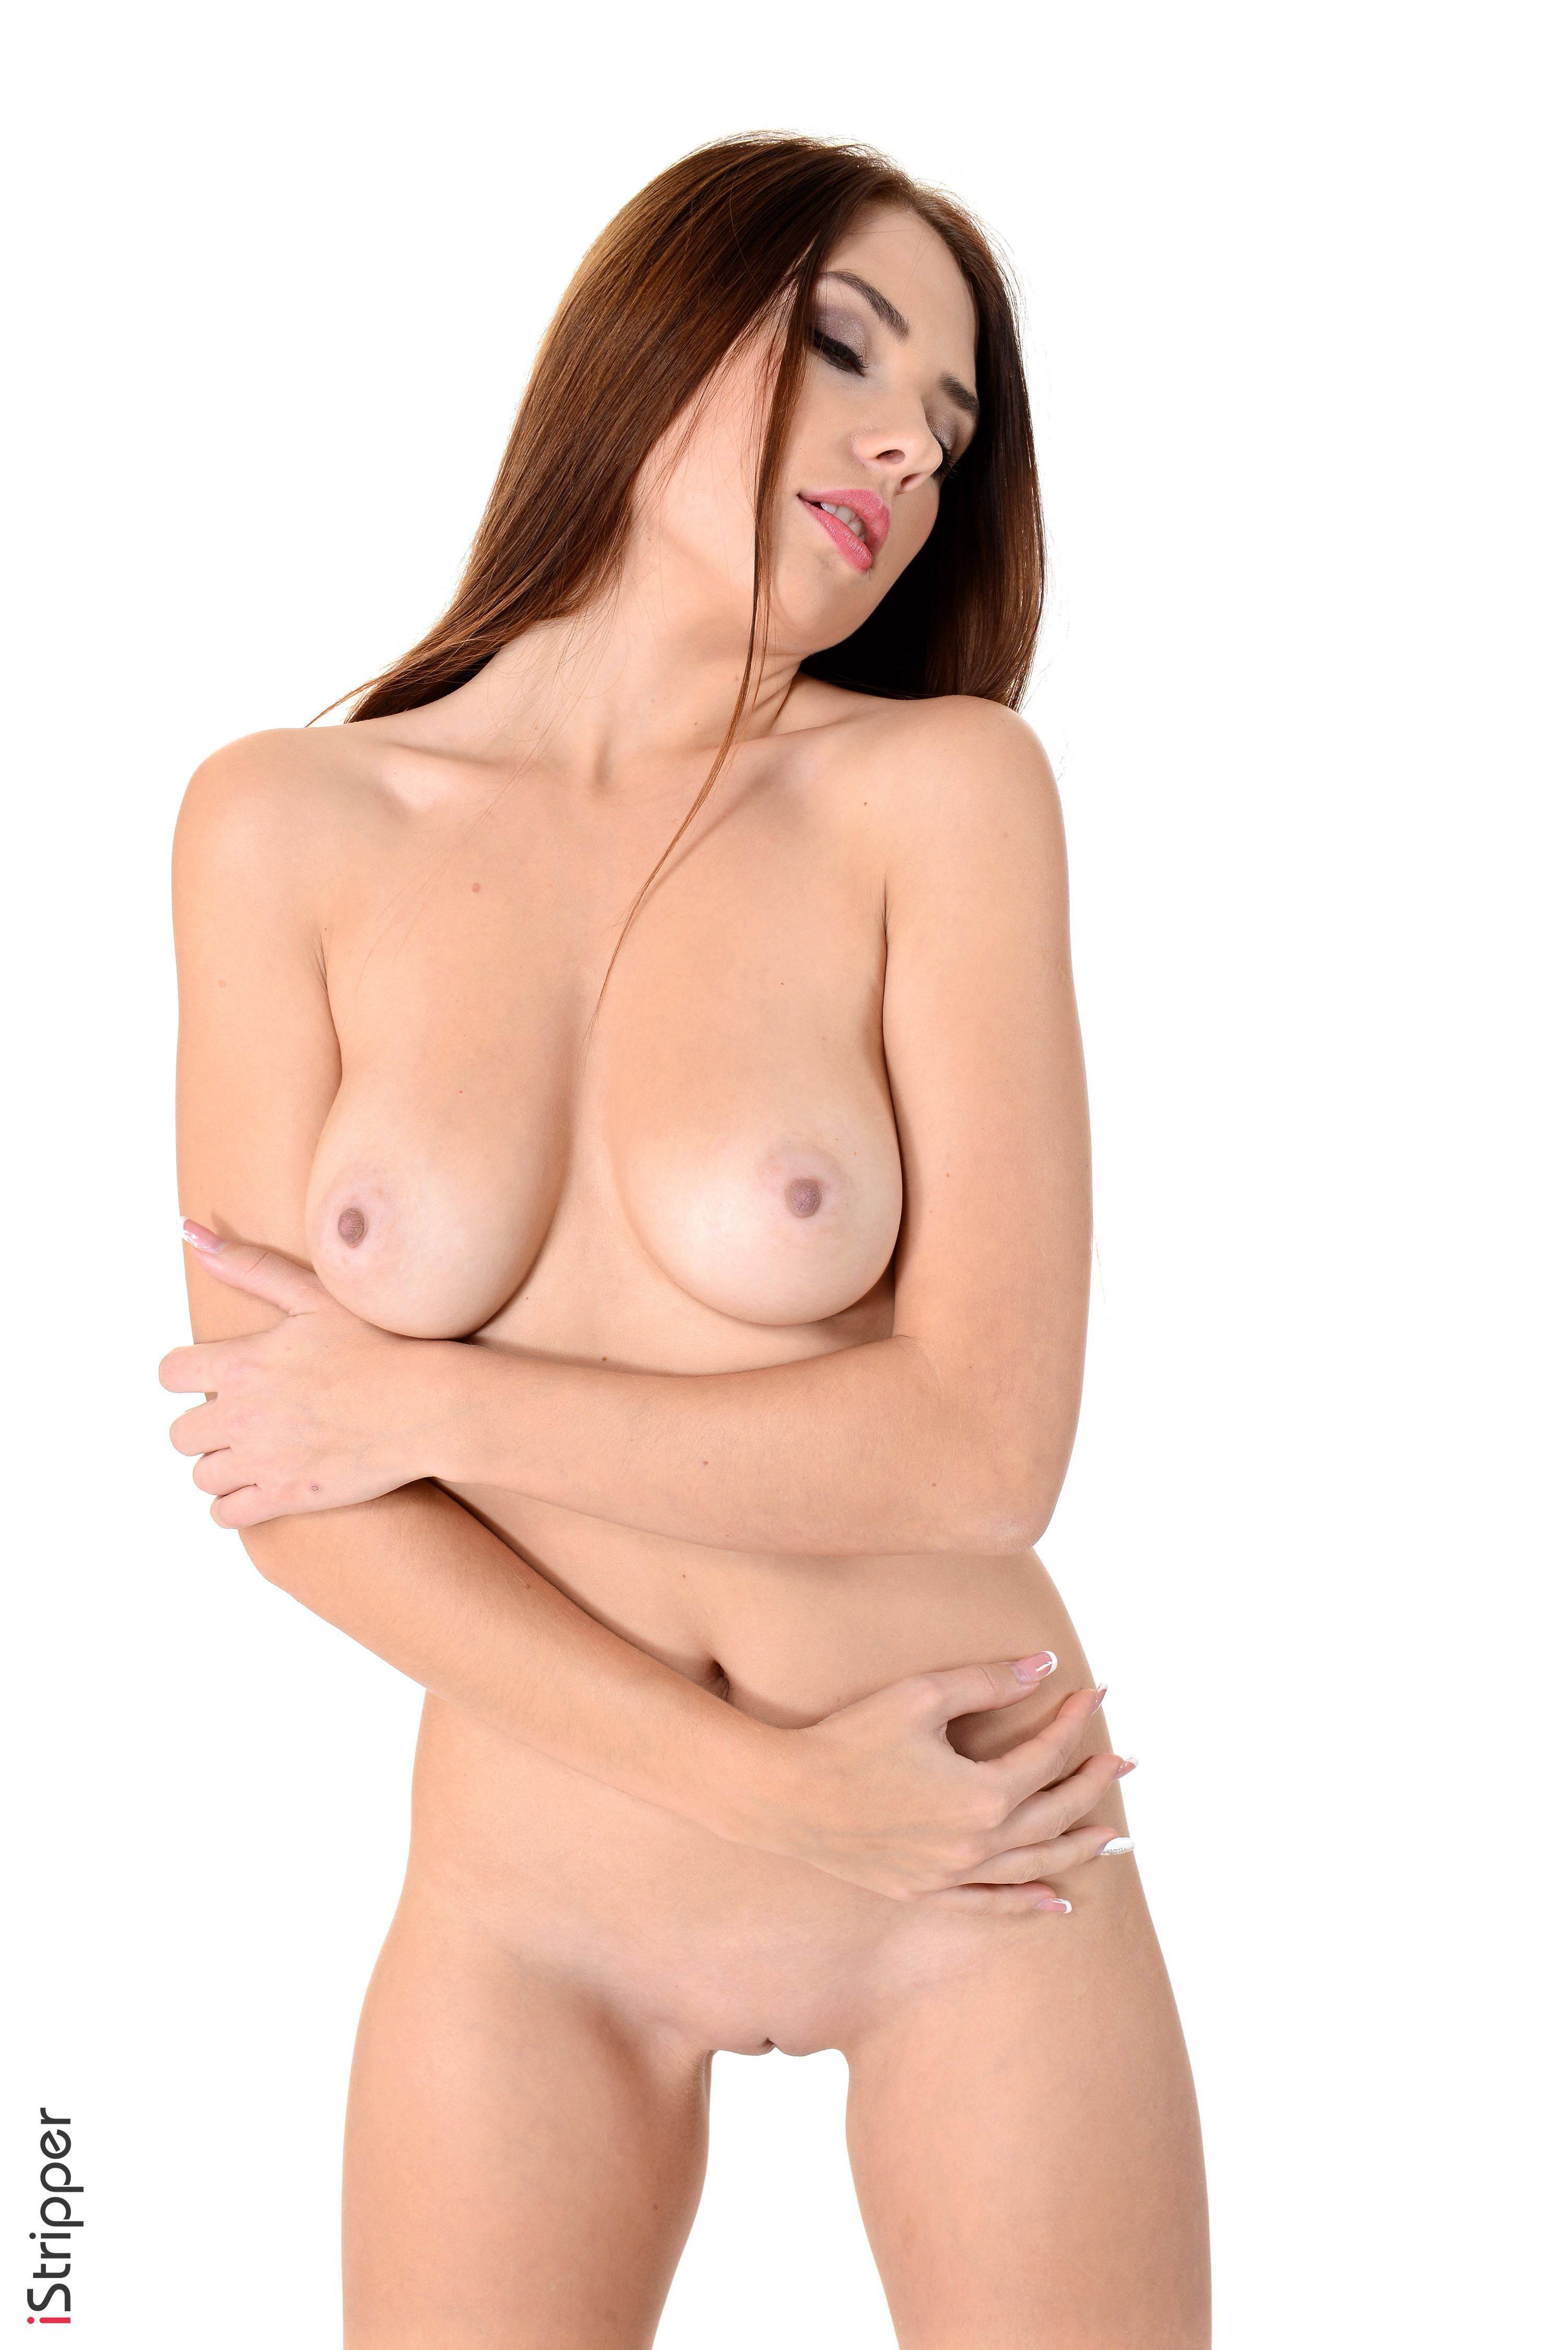 hot naked women wallpaper